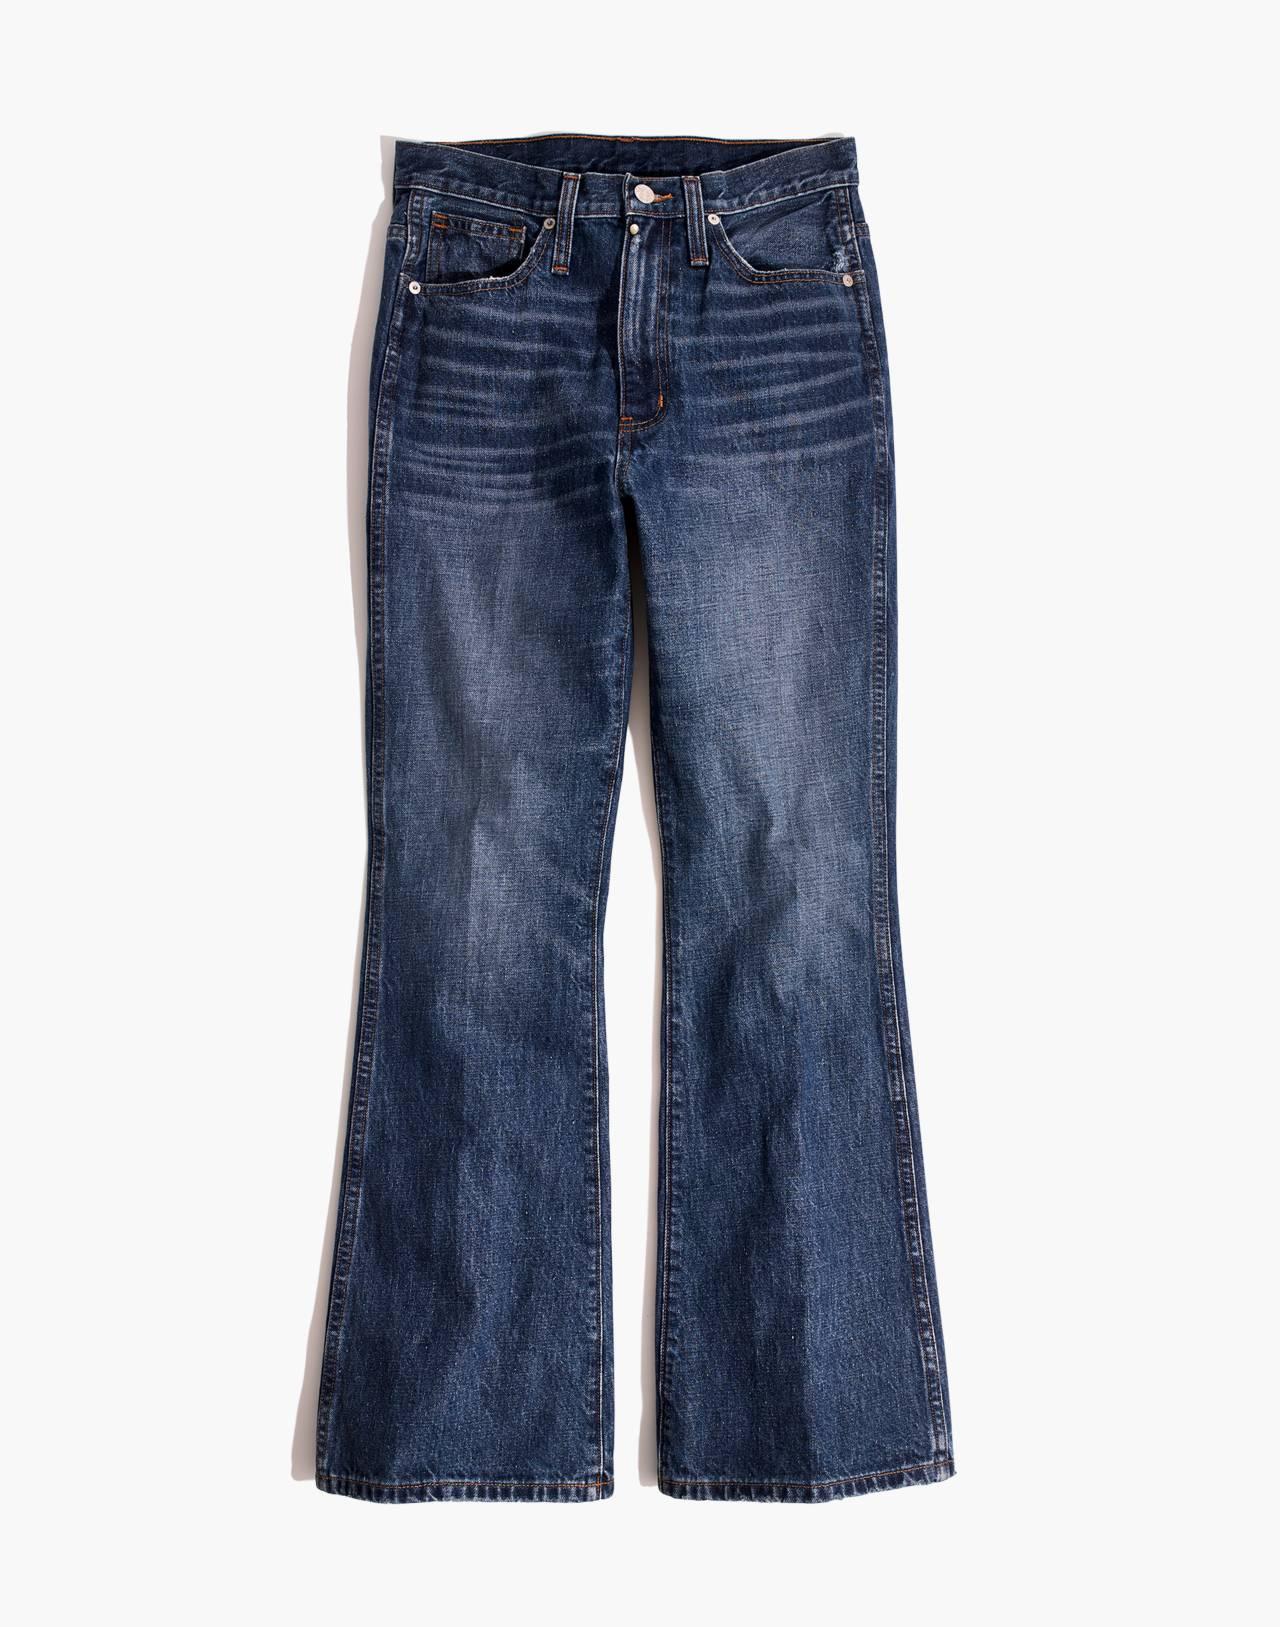 Tall Rigid Flare Jeans in delaford wash image 4